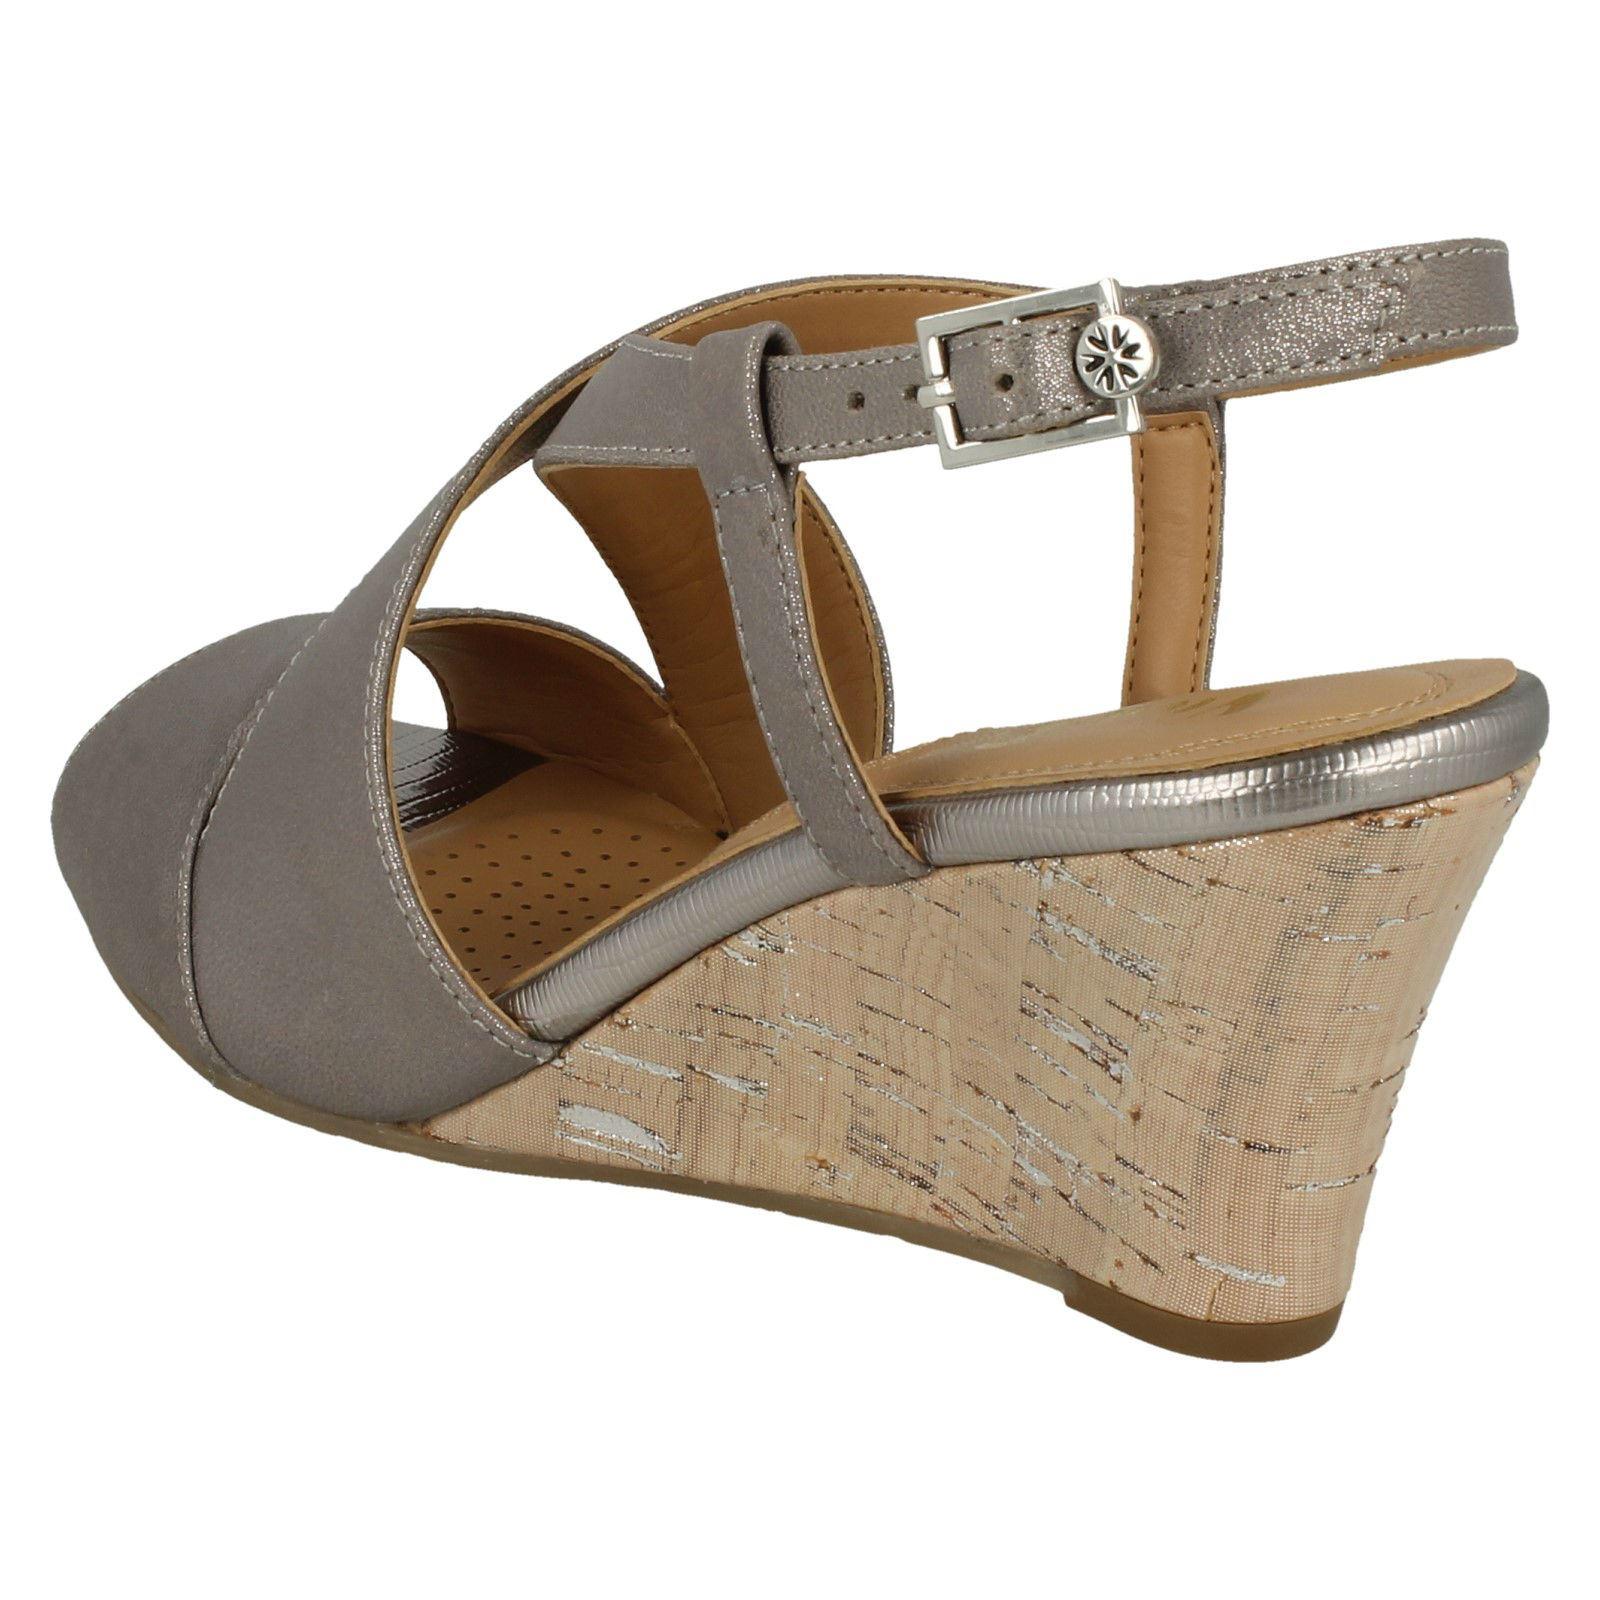 Ladies-Van-Dal-Cross-Strap-Wedged-Sandal-Allora thumbnail 23